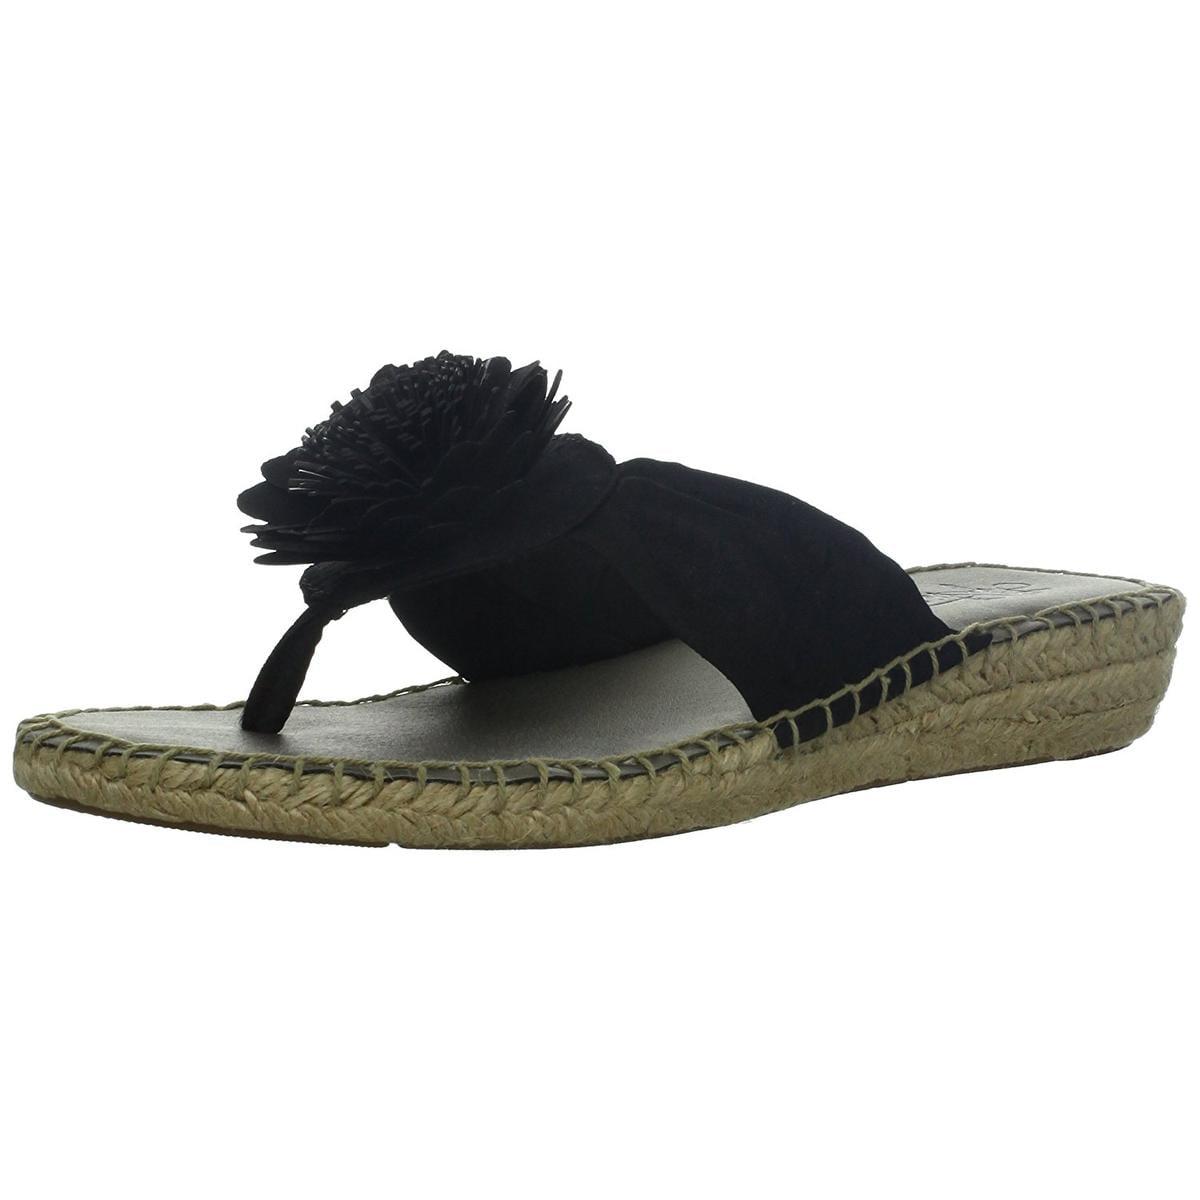 Lifestride Rio Tres Womens Black Sandals by LifeStride